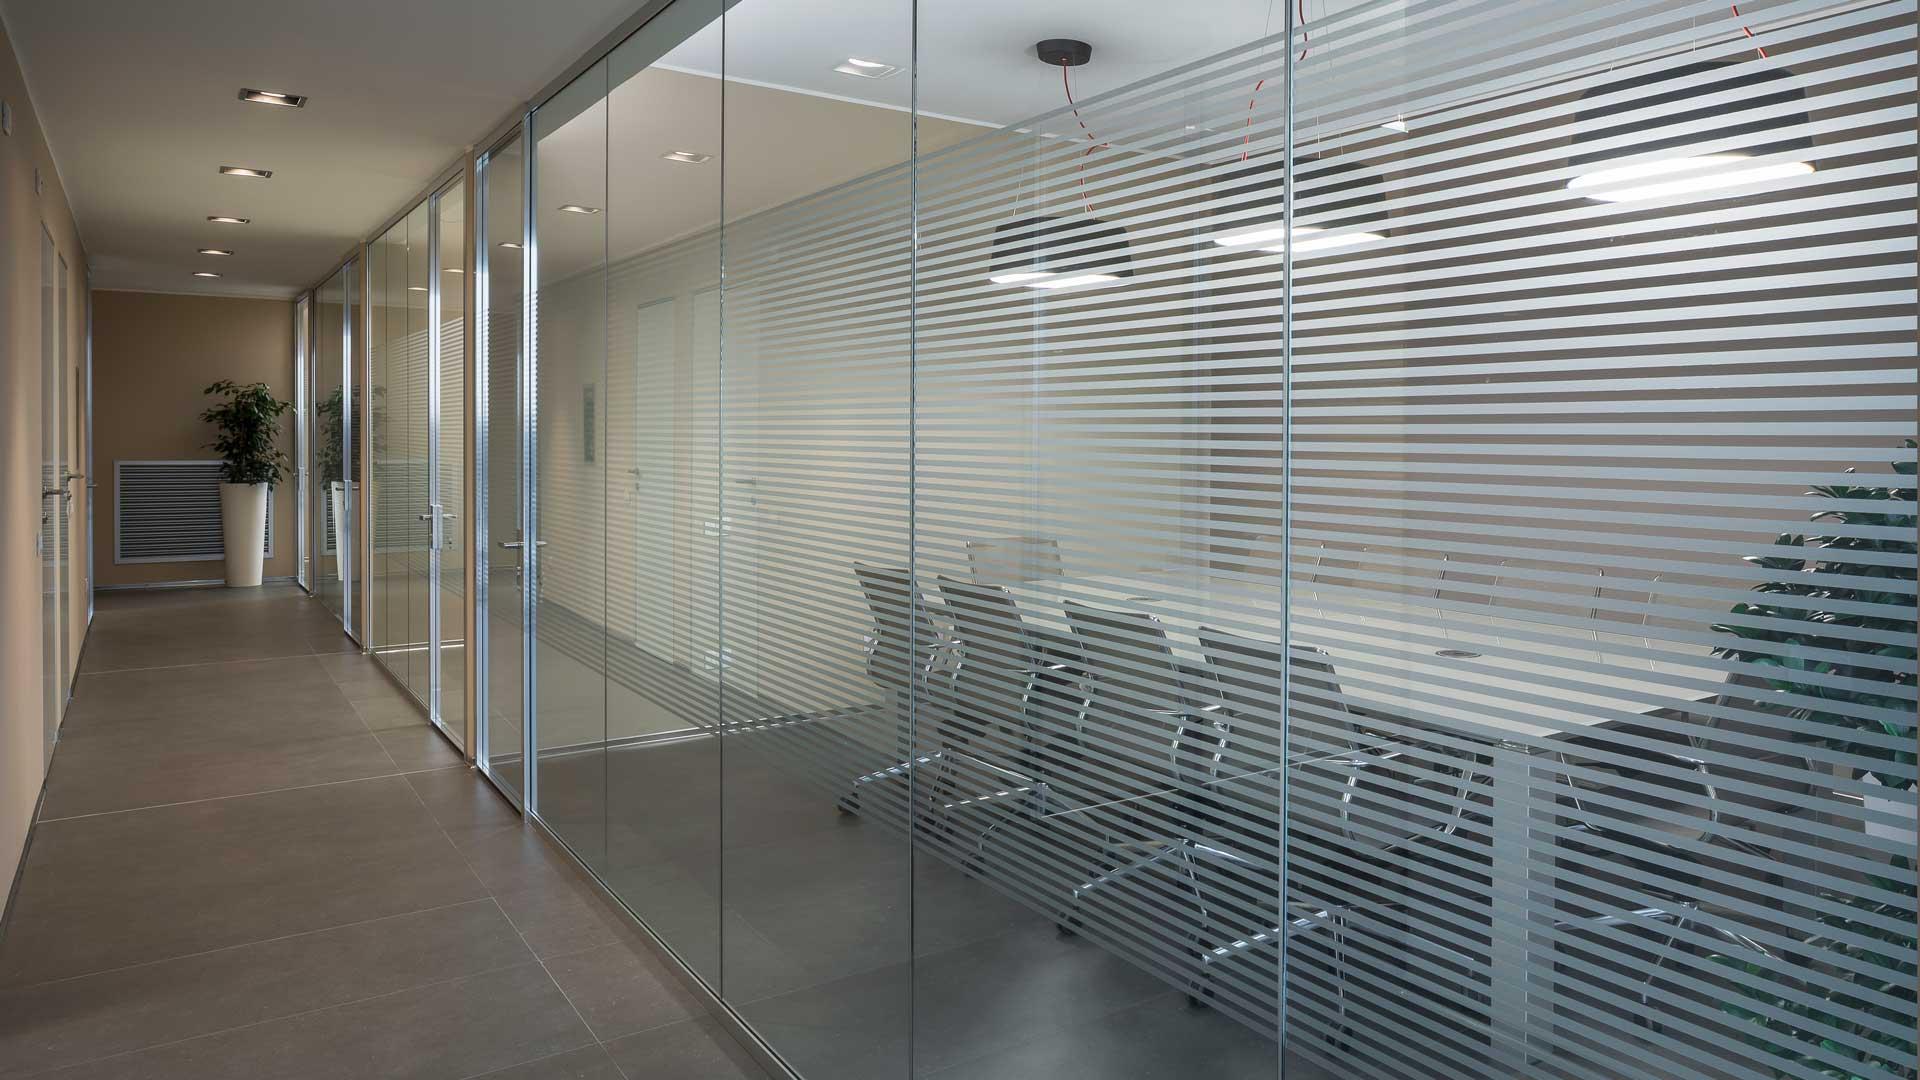 Realizzare Parete In Cartongesso pareti divisorie o pareti in cartongesso per ufficio, quale